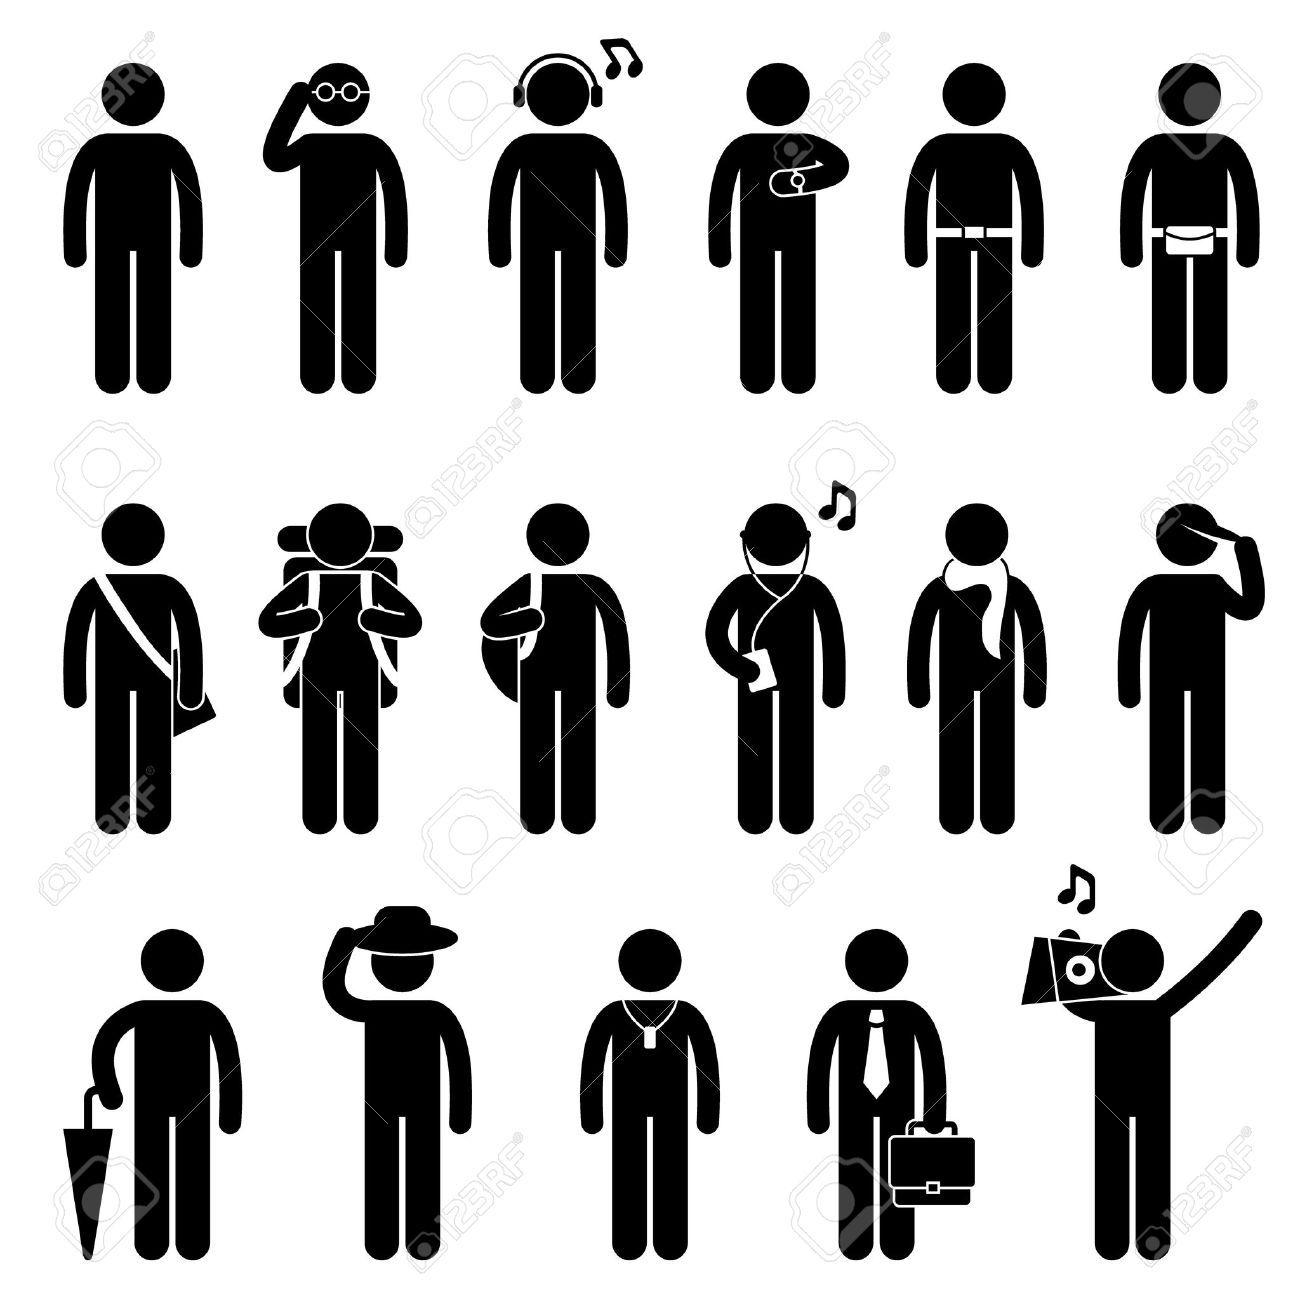 Stock Vector Pictogram, Stick figures, Person icon